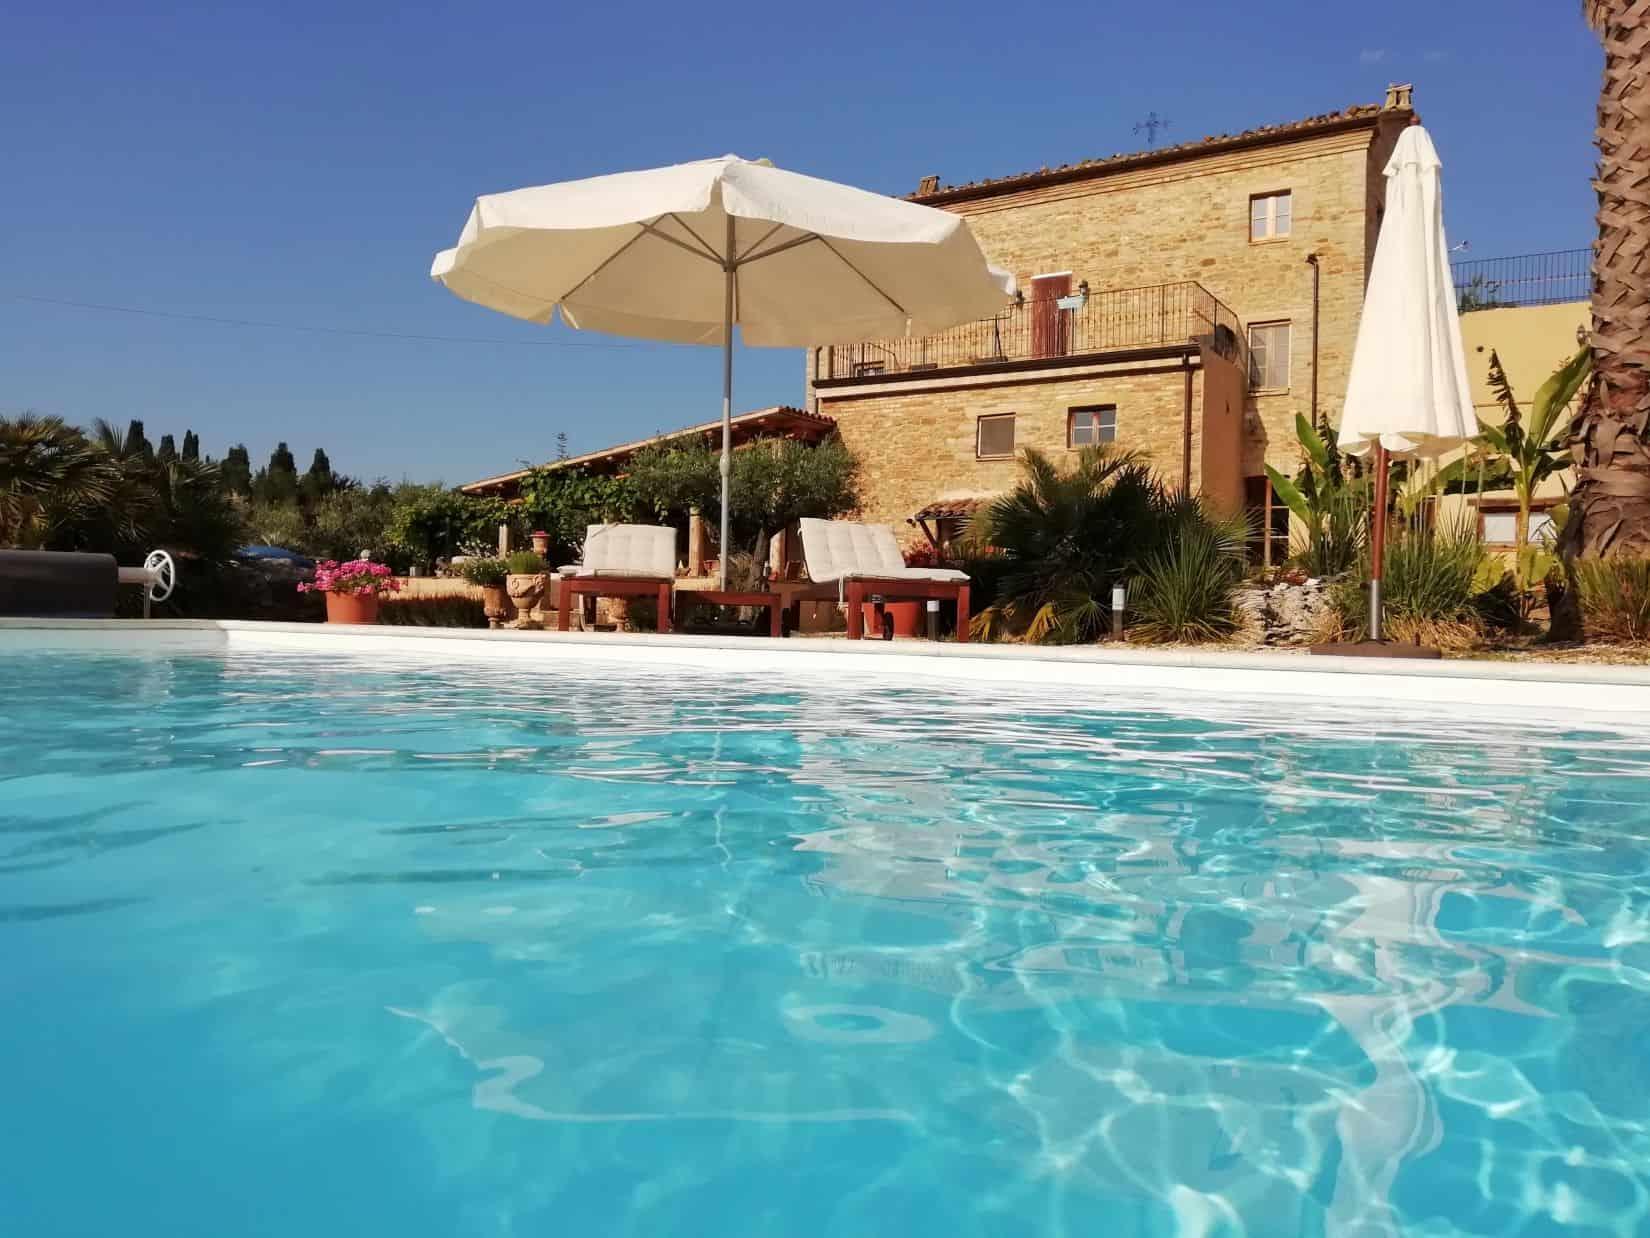 Prestigious Farmhouse with pool, vineyard and olive trees, 4 ha of land.